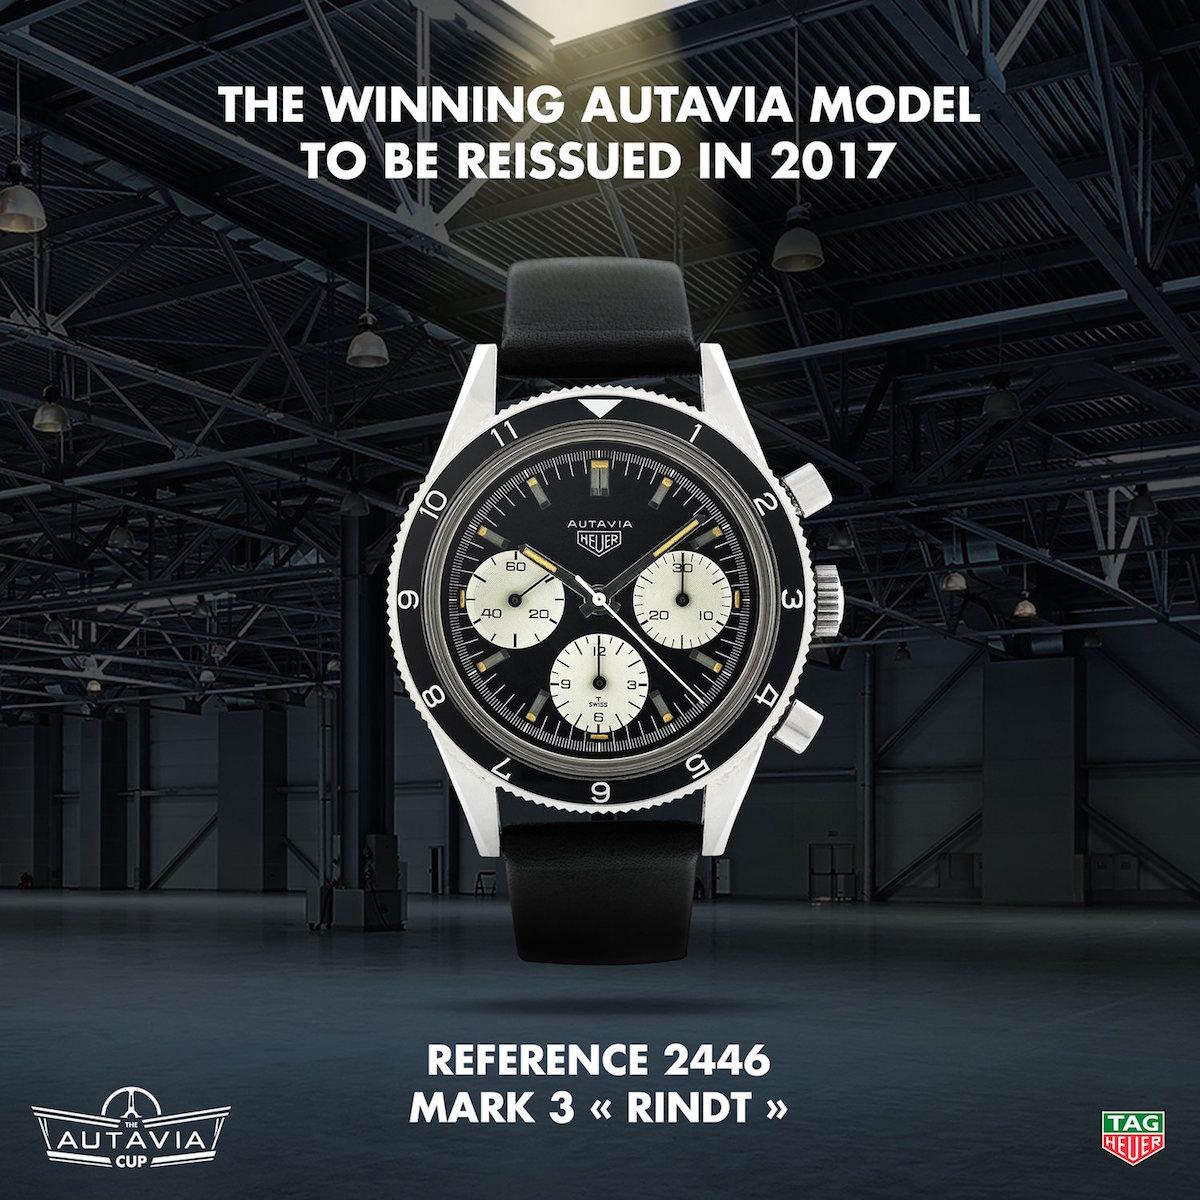 Tag-Heuer-Autavia-Cup-Winner-Autavia-2446-Mark-3-Jochen-Rindt-2